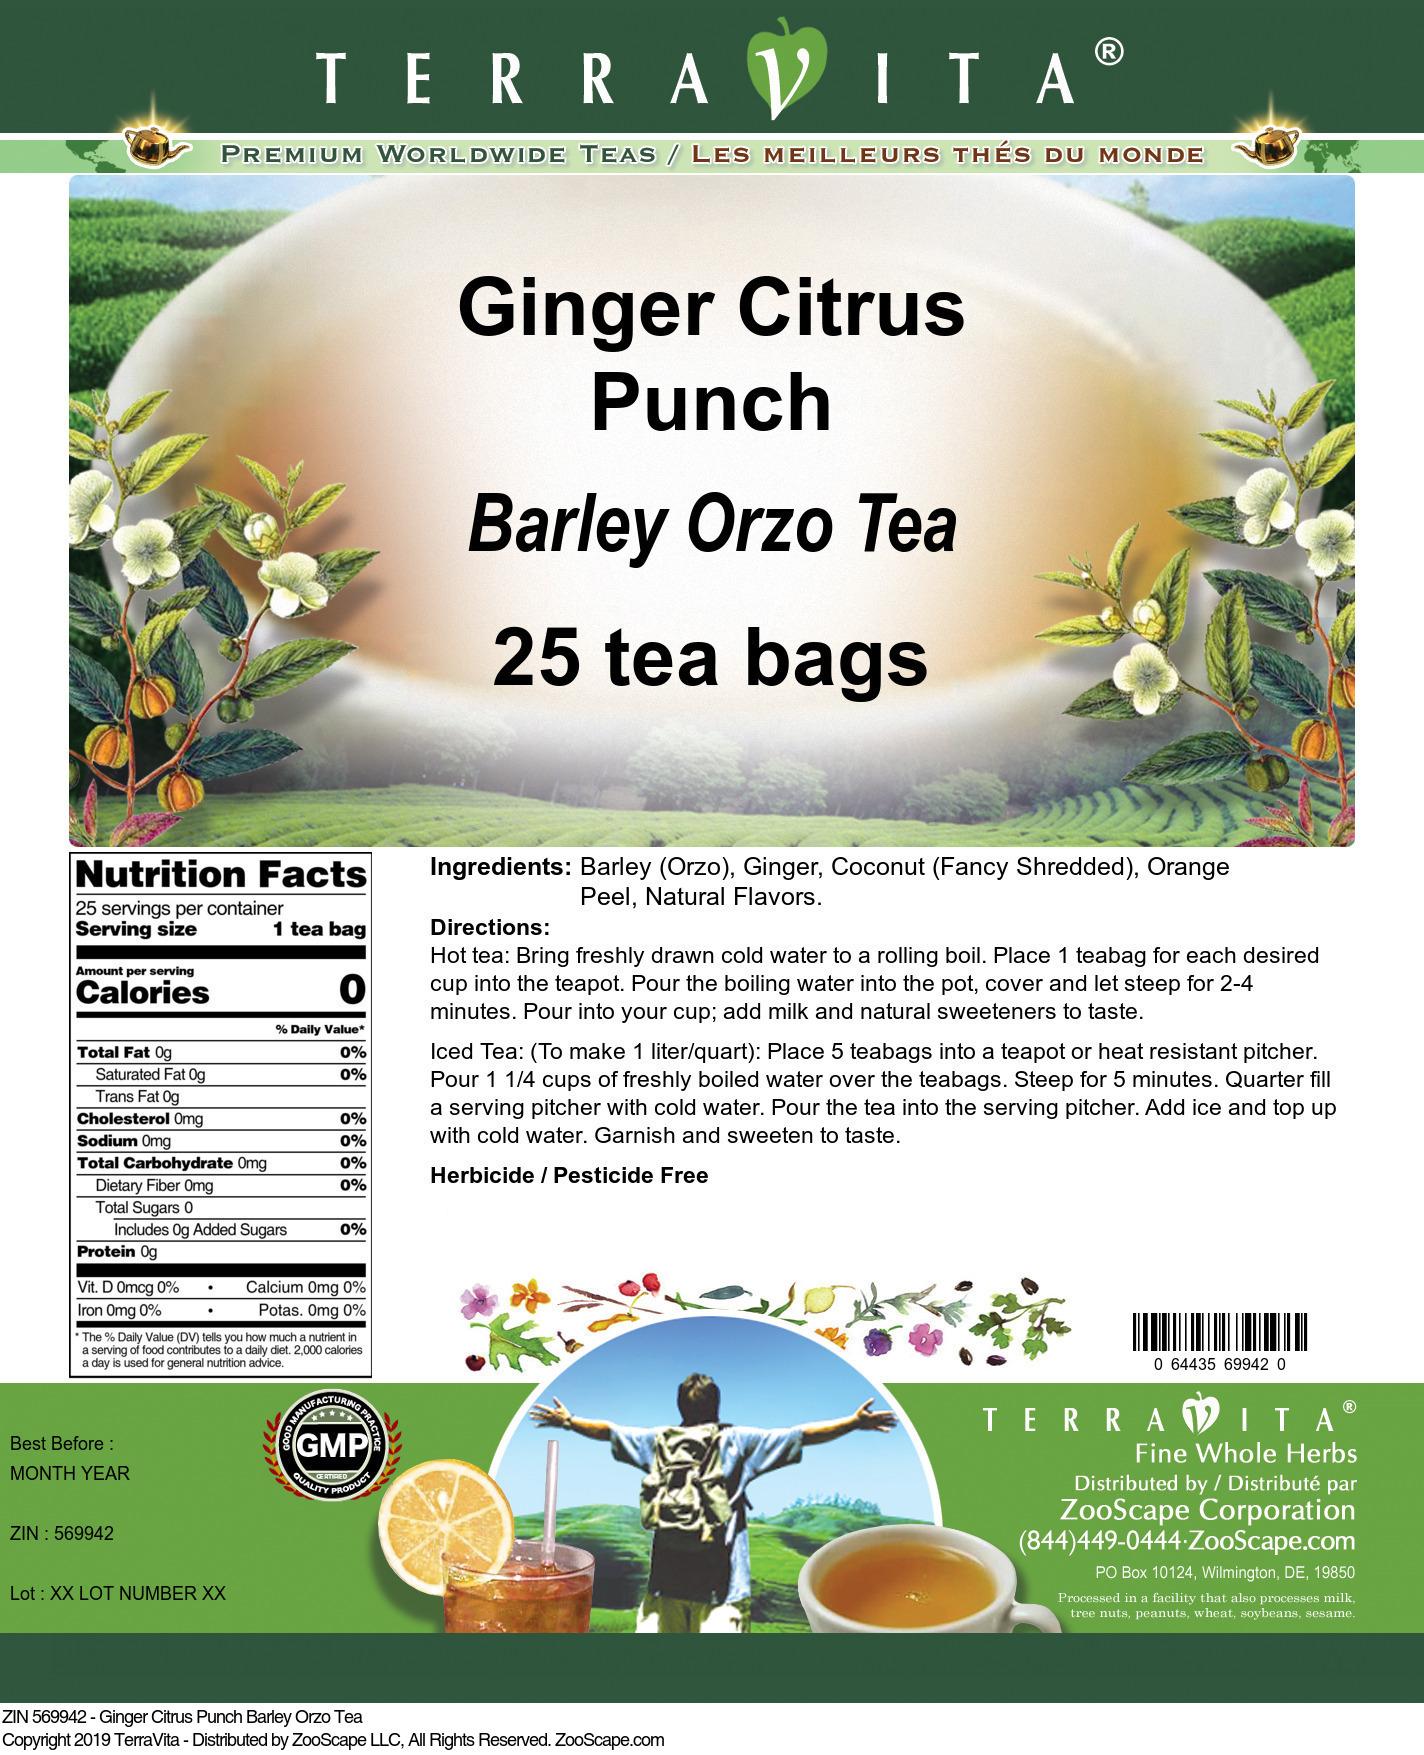 Ginger Citrus Punch Barley Orzo